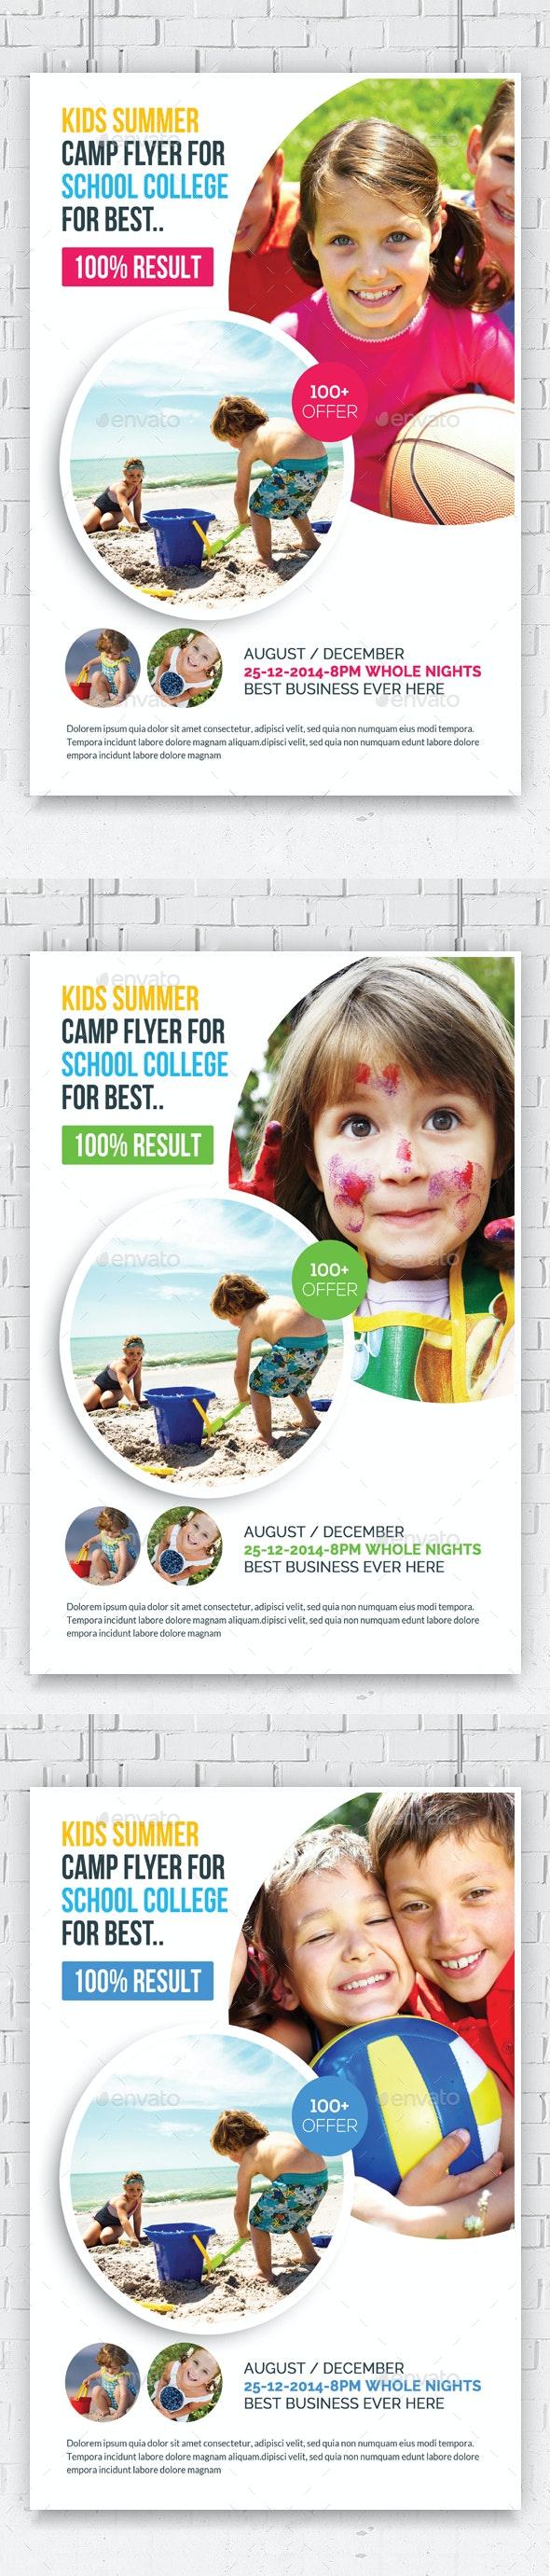 Kids Summer Camp Flyers - Flyers Print Templates